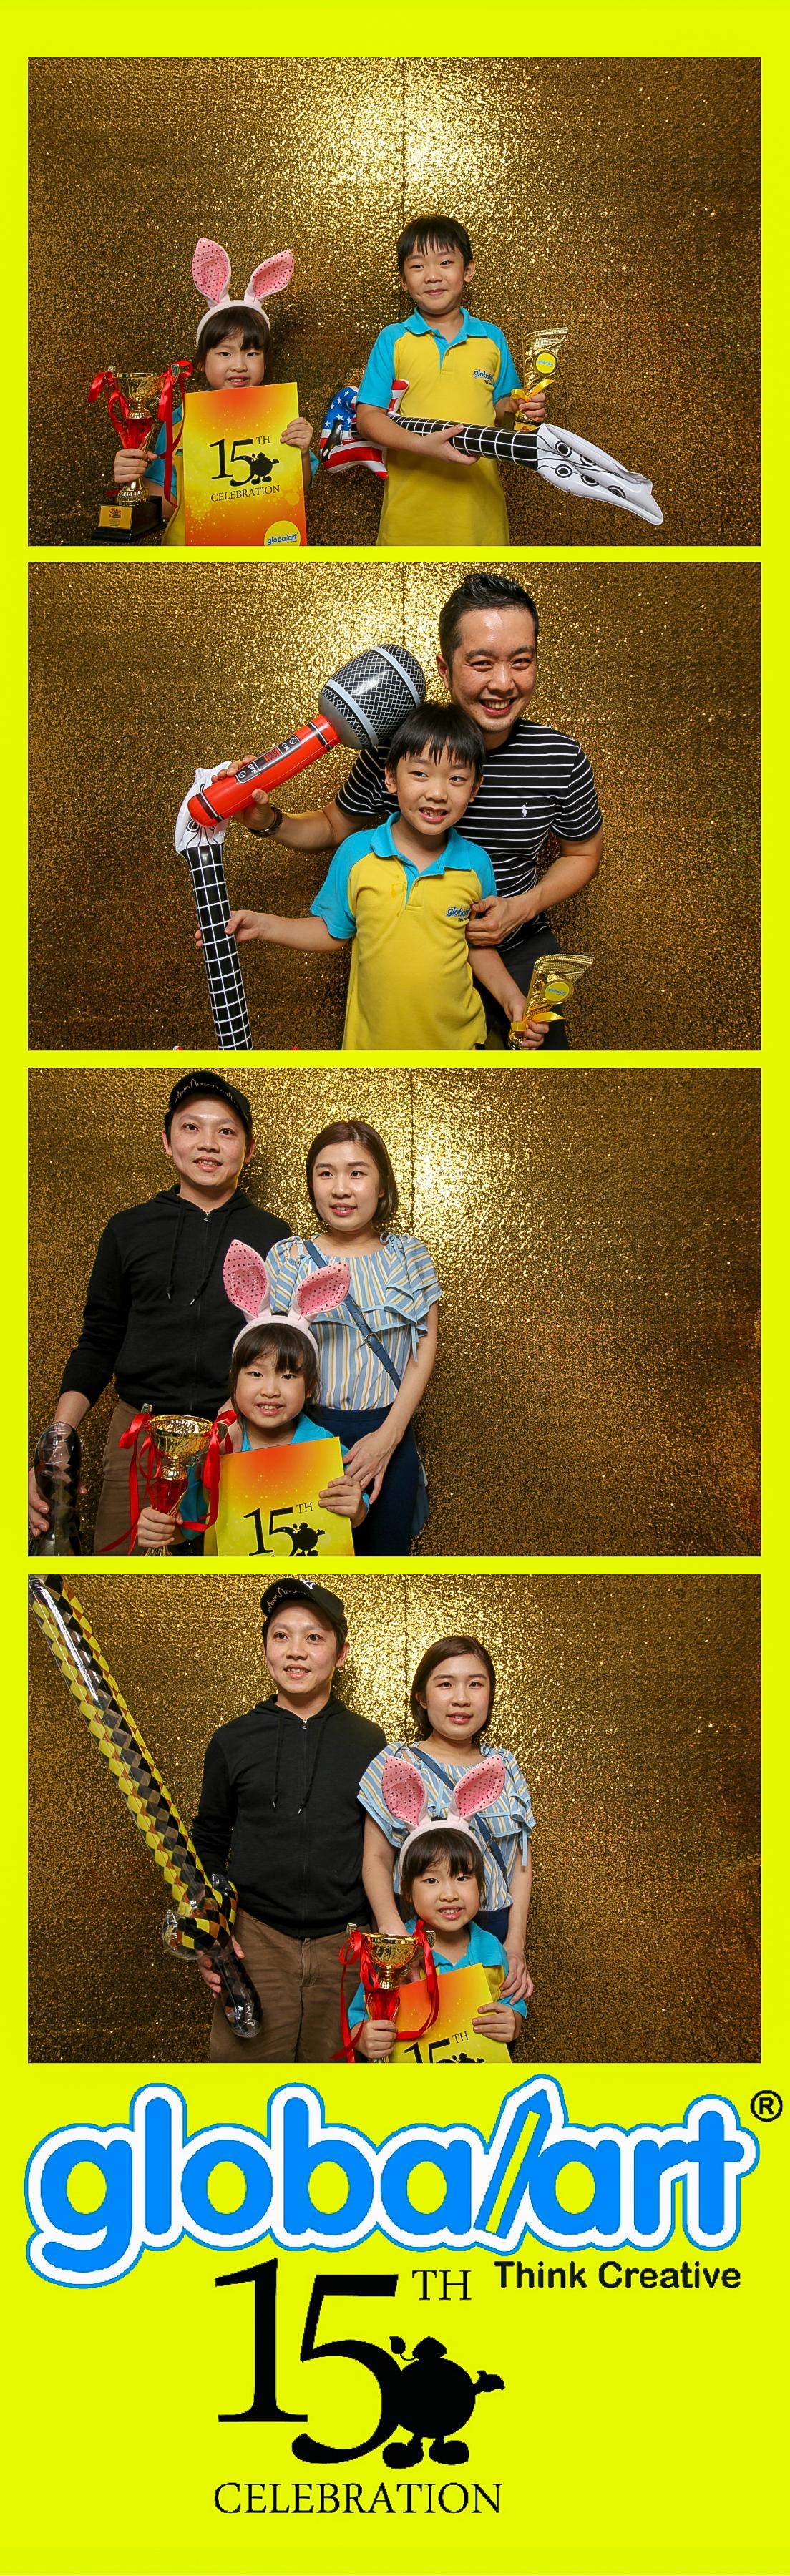 global art photo booth singapore (13)